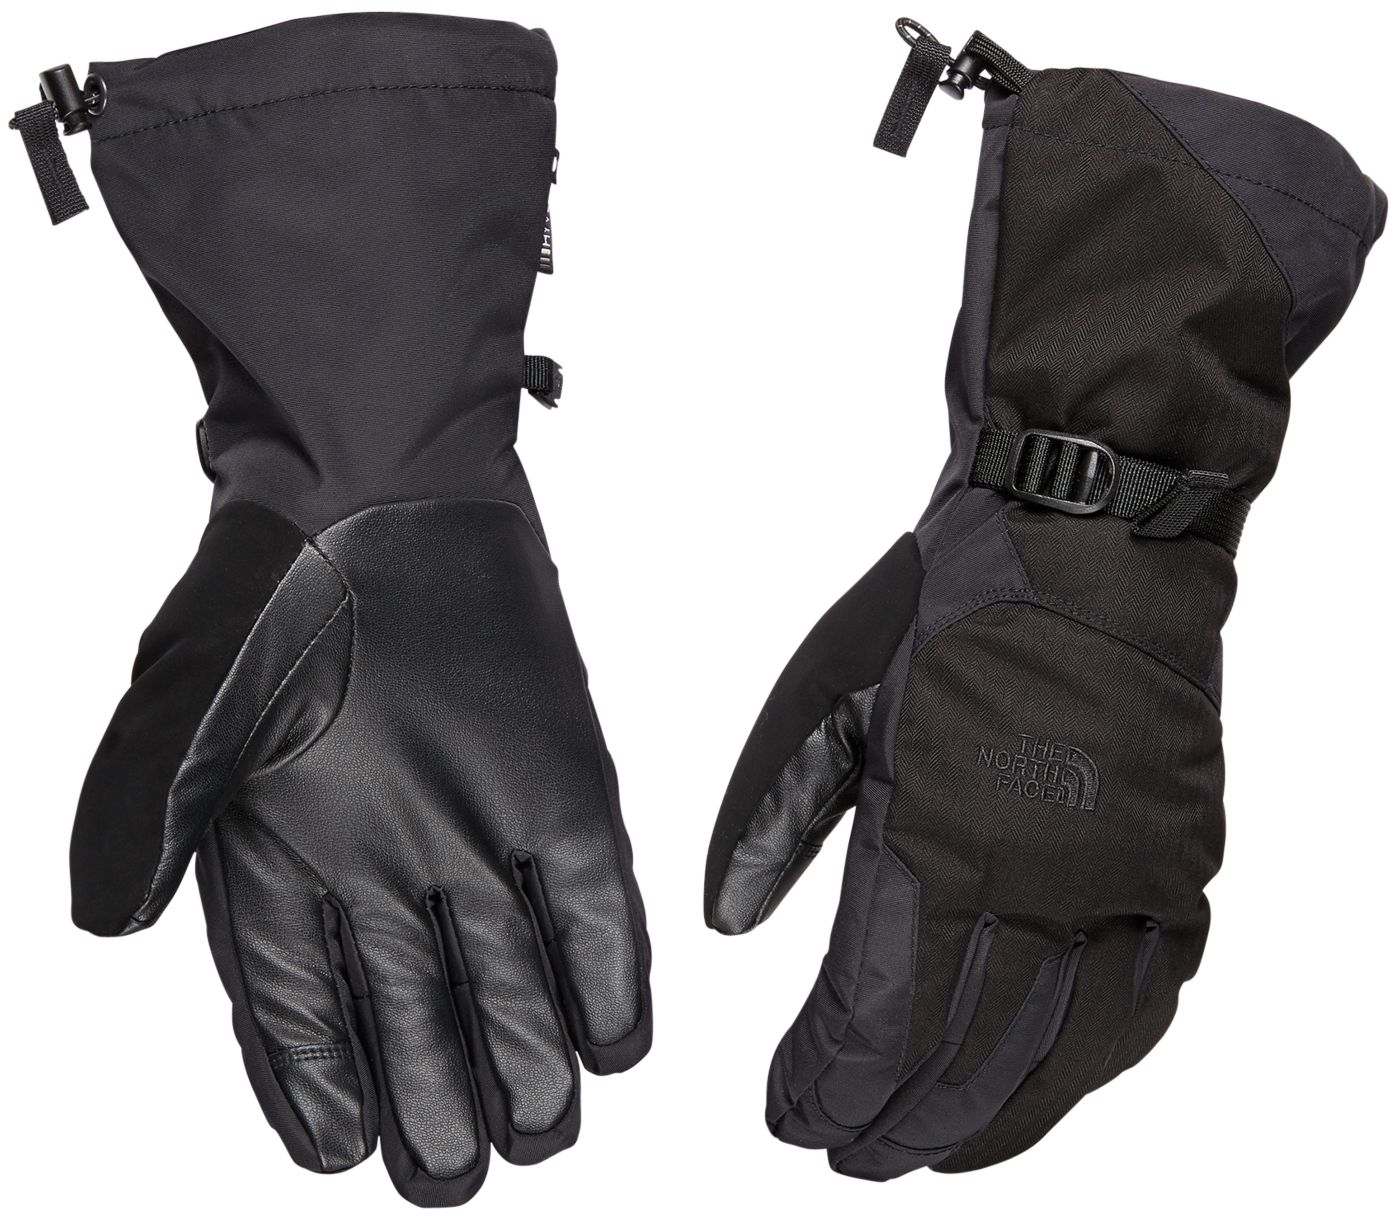 The North Face Men's Montana Etip Gloves